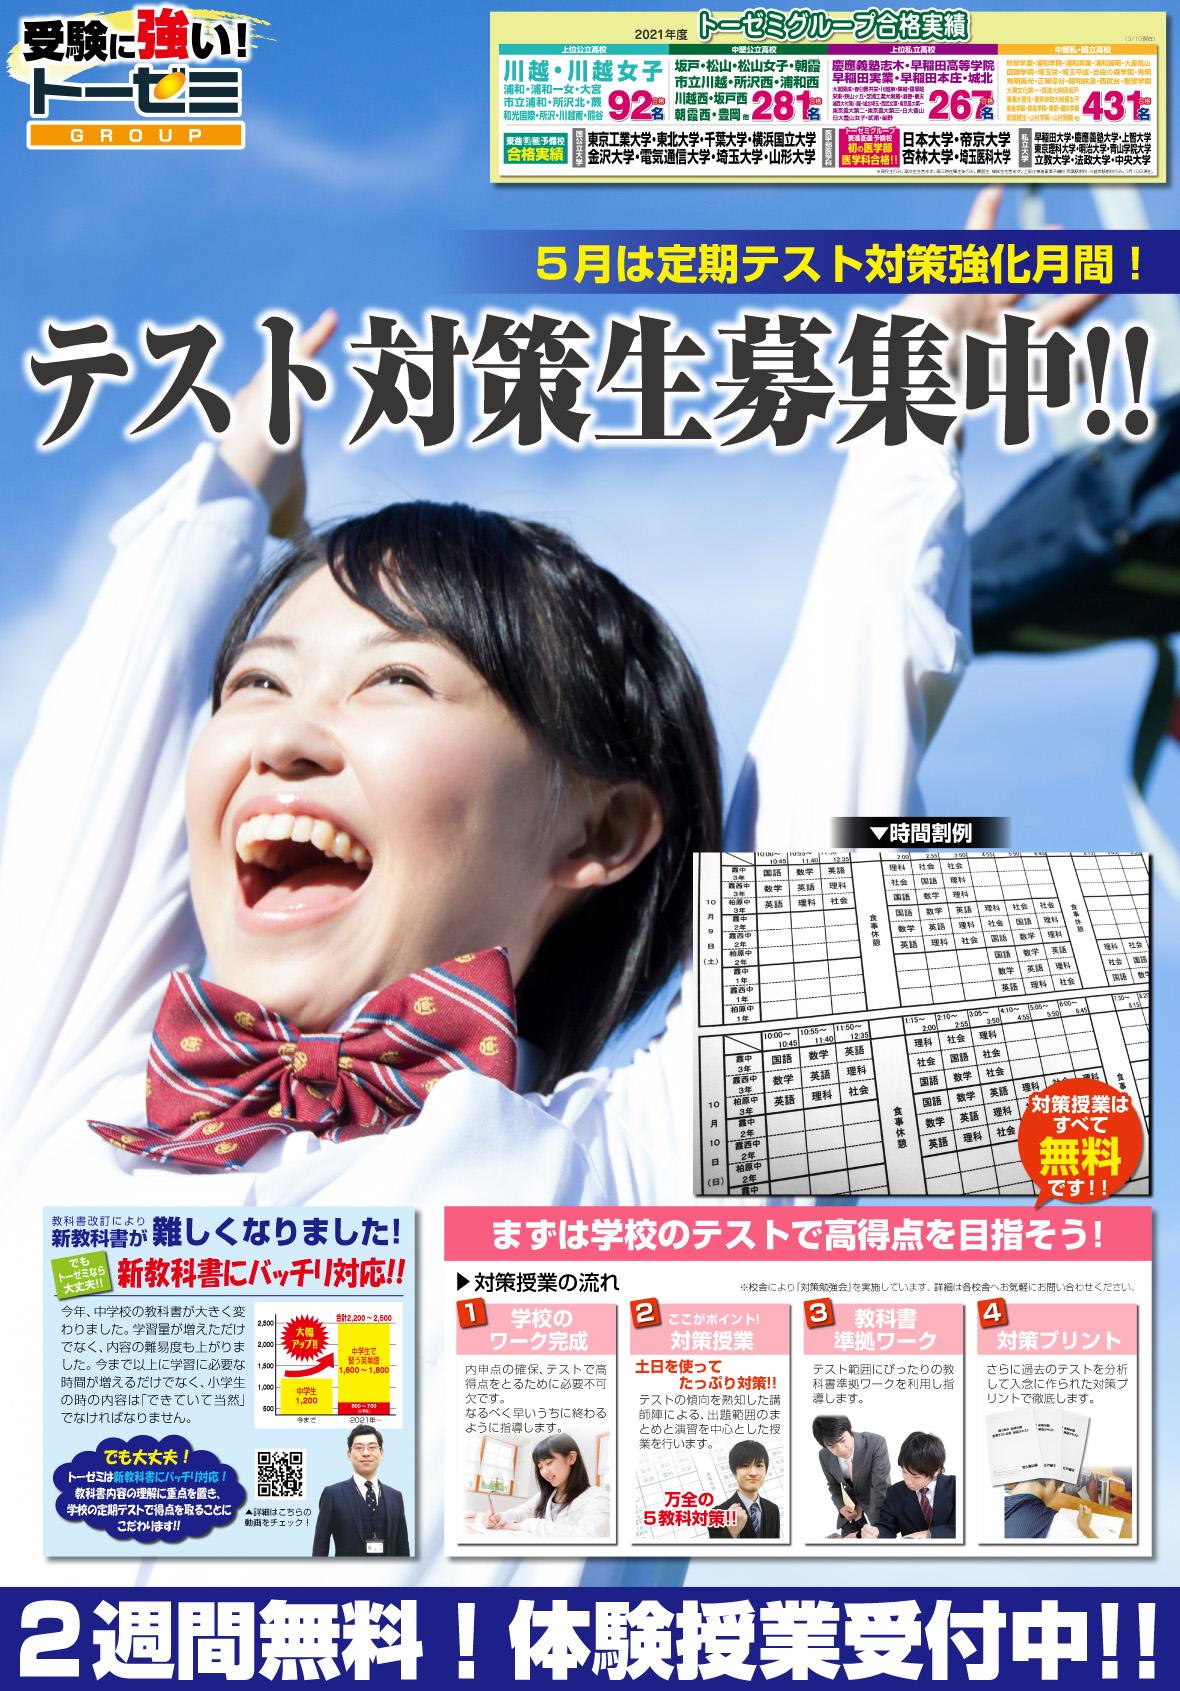 21_5月新規生募集ポスター_cs5